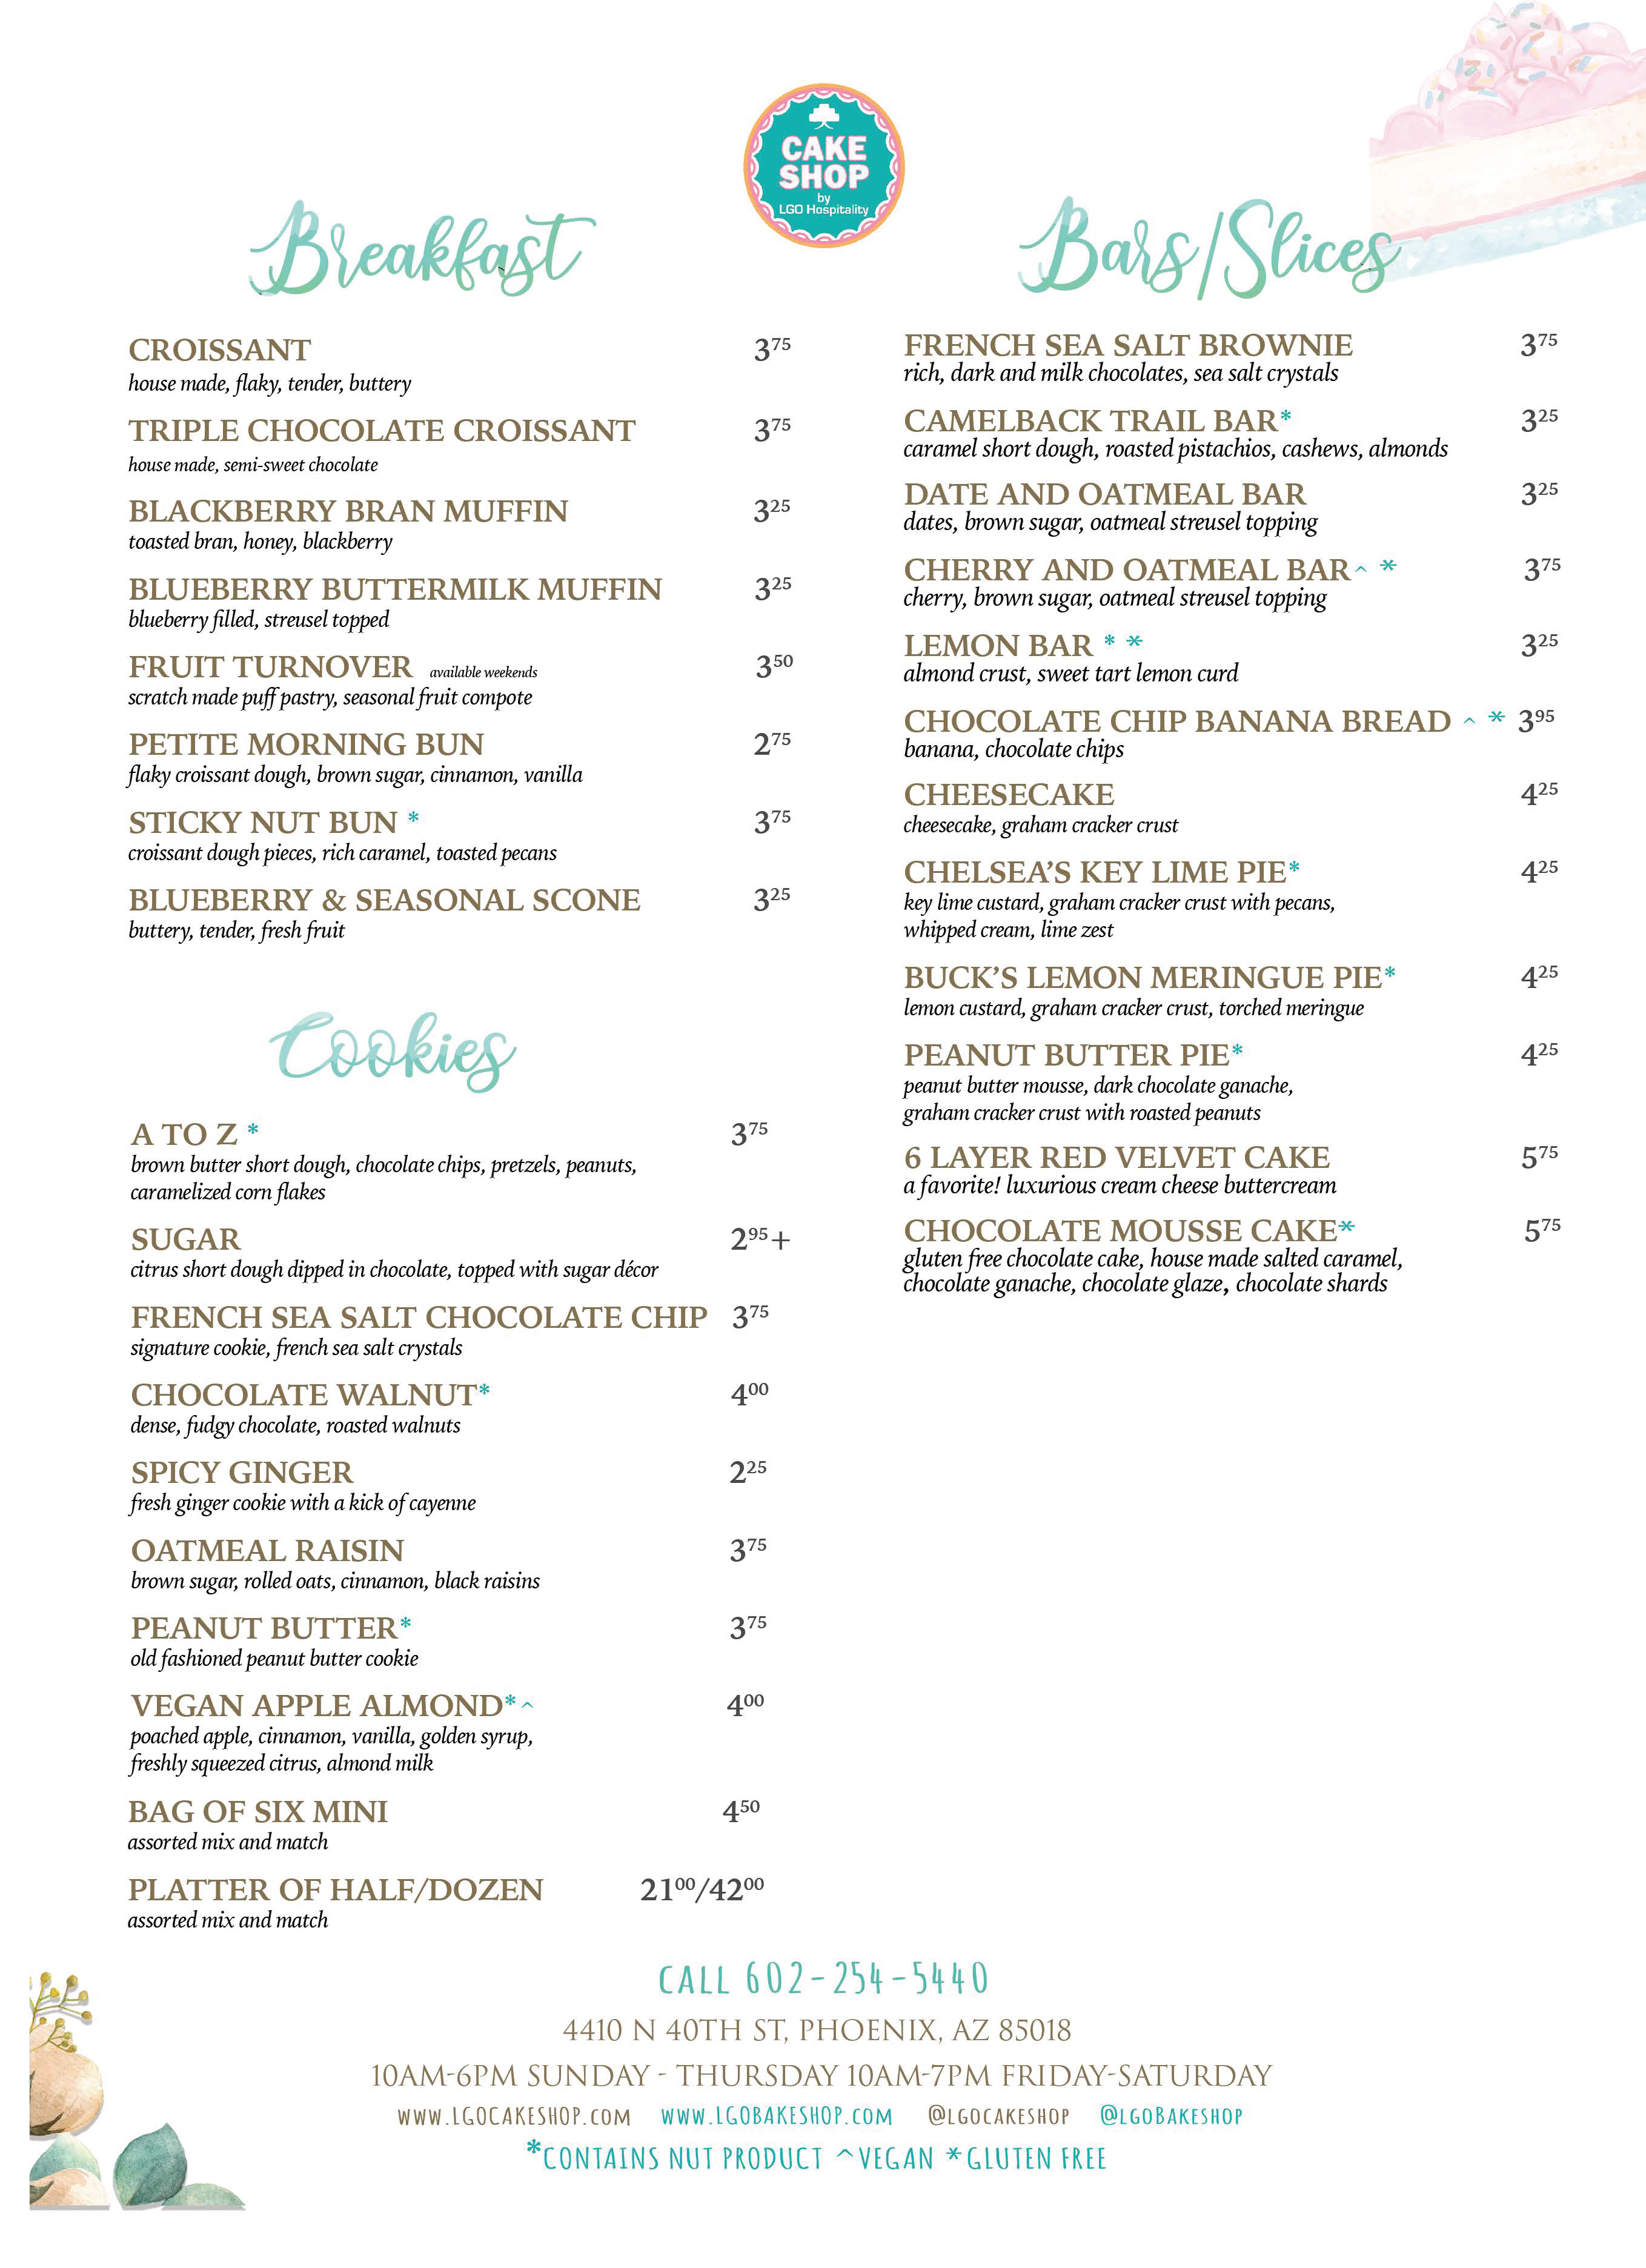 Cake Shop menu back